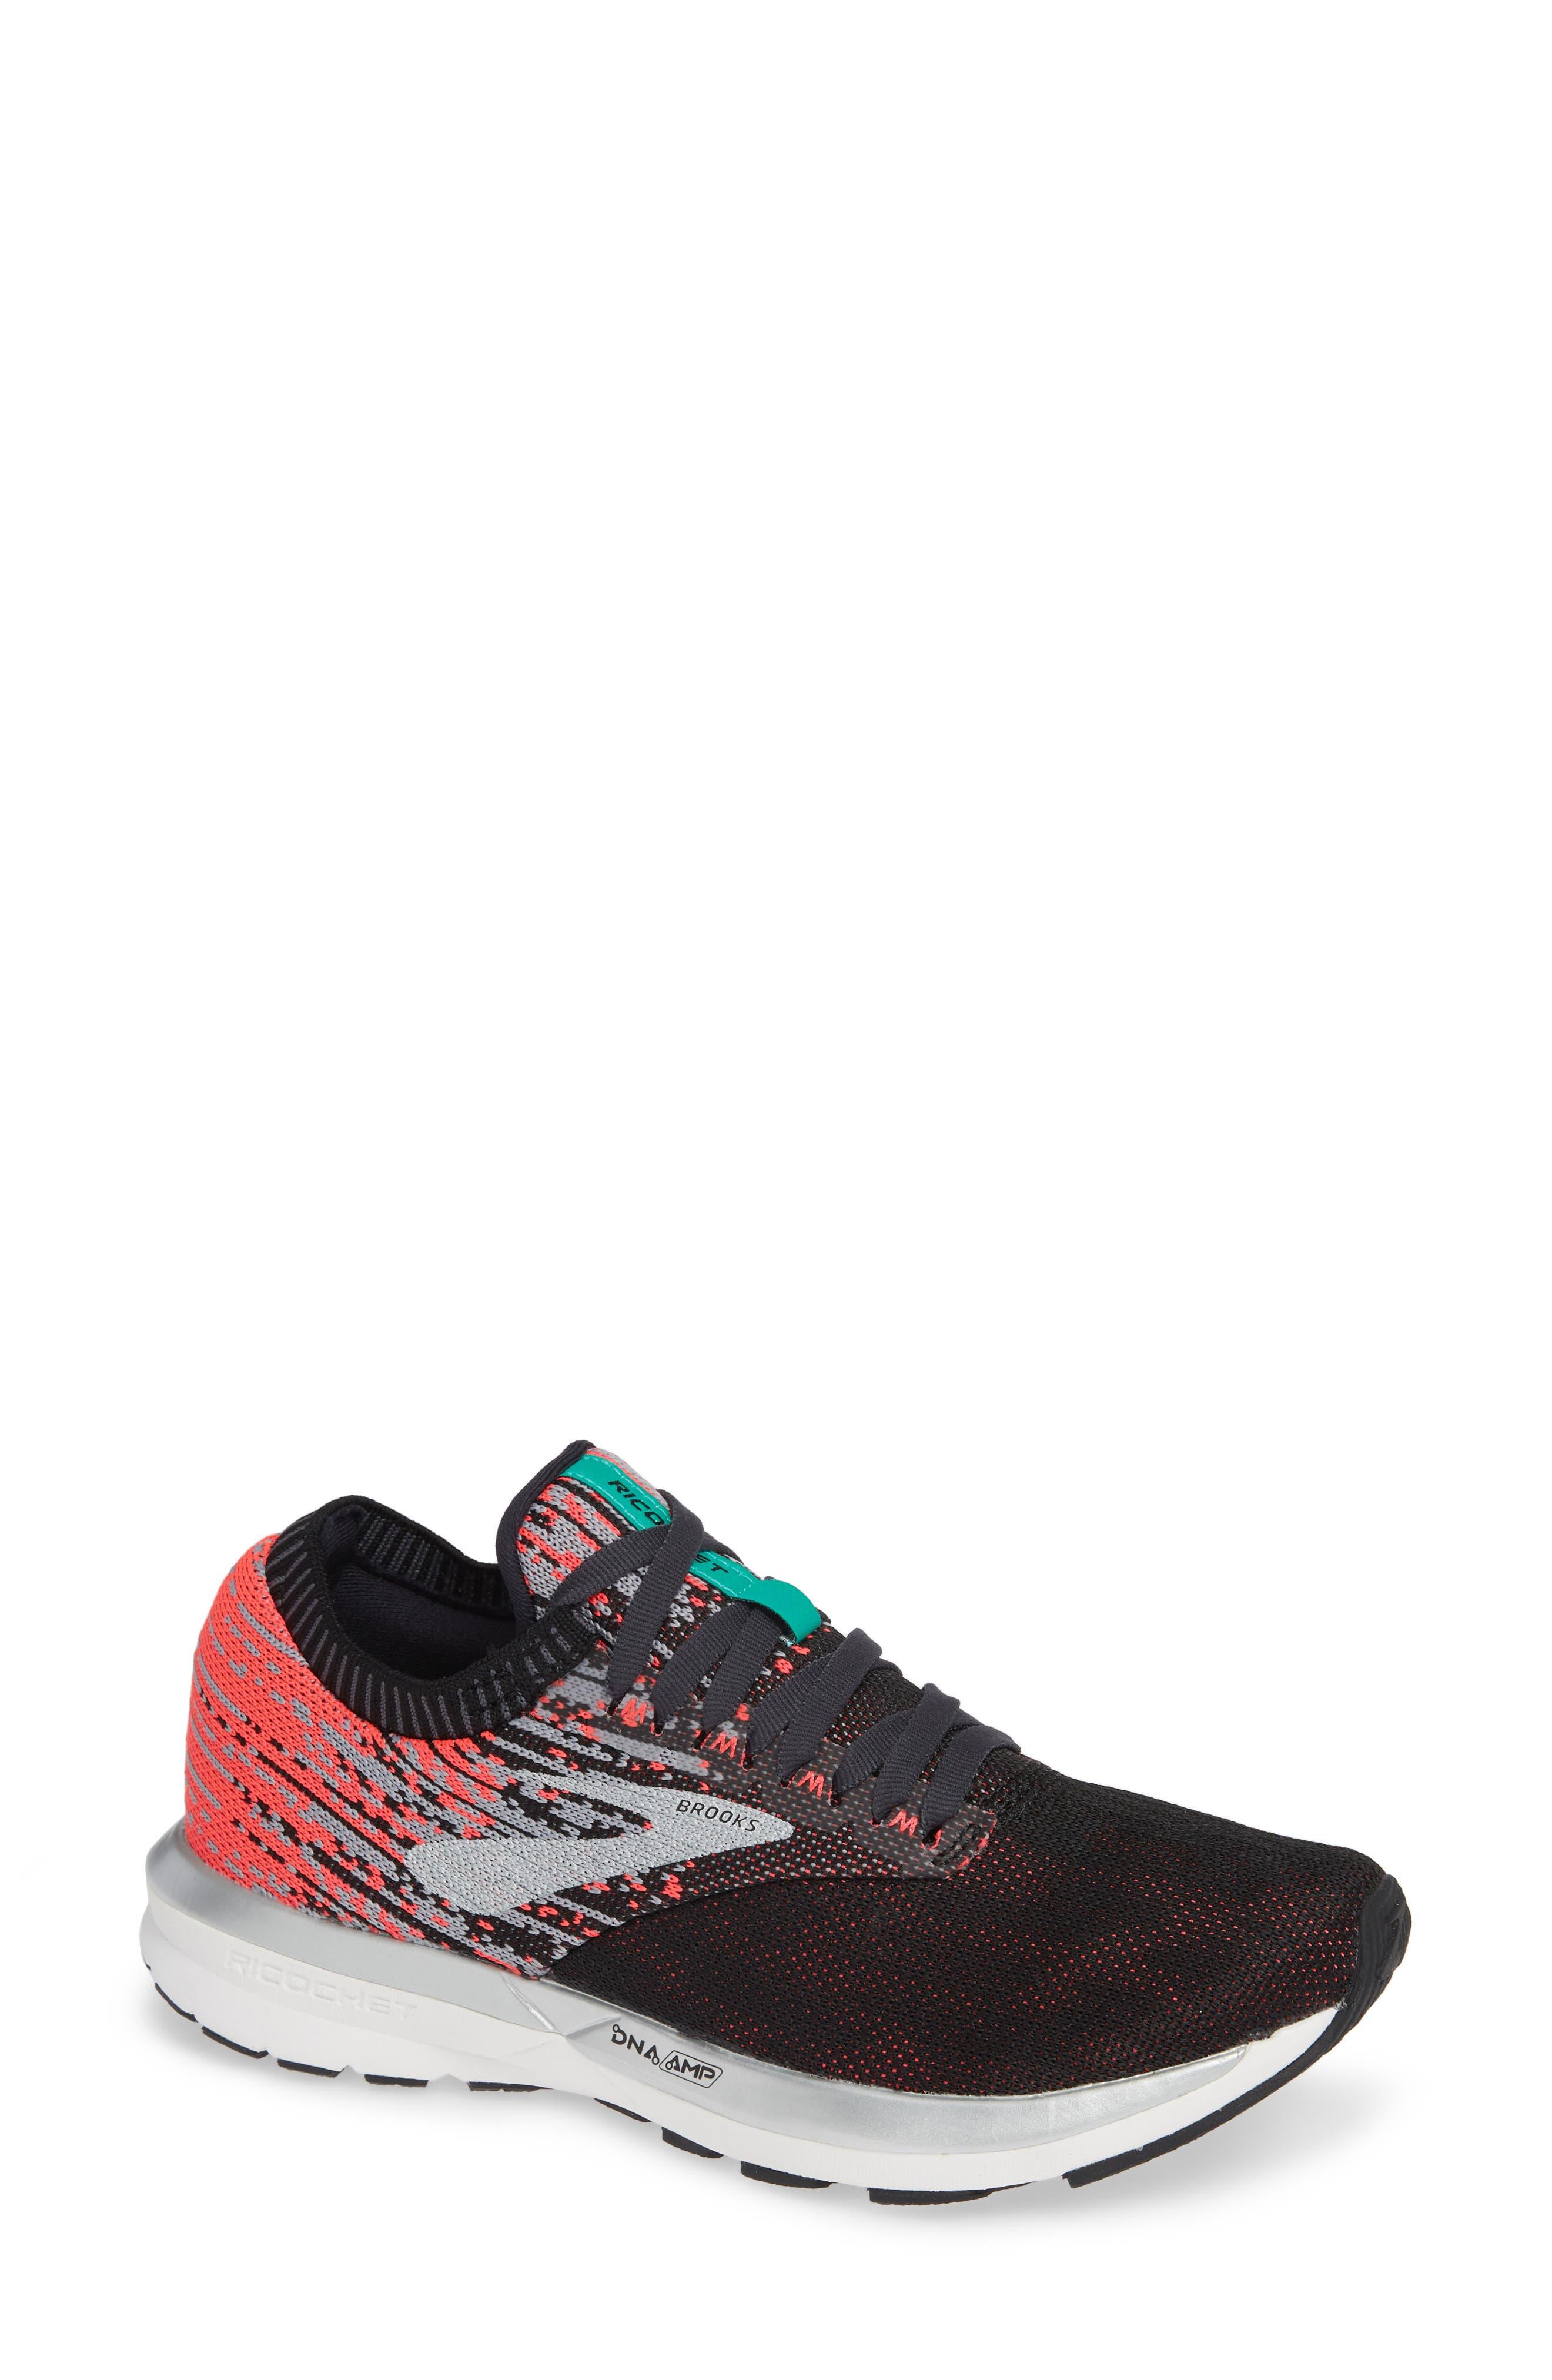 d060e98de8afa Grey Brooks for Women  Running Shoes